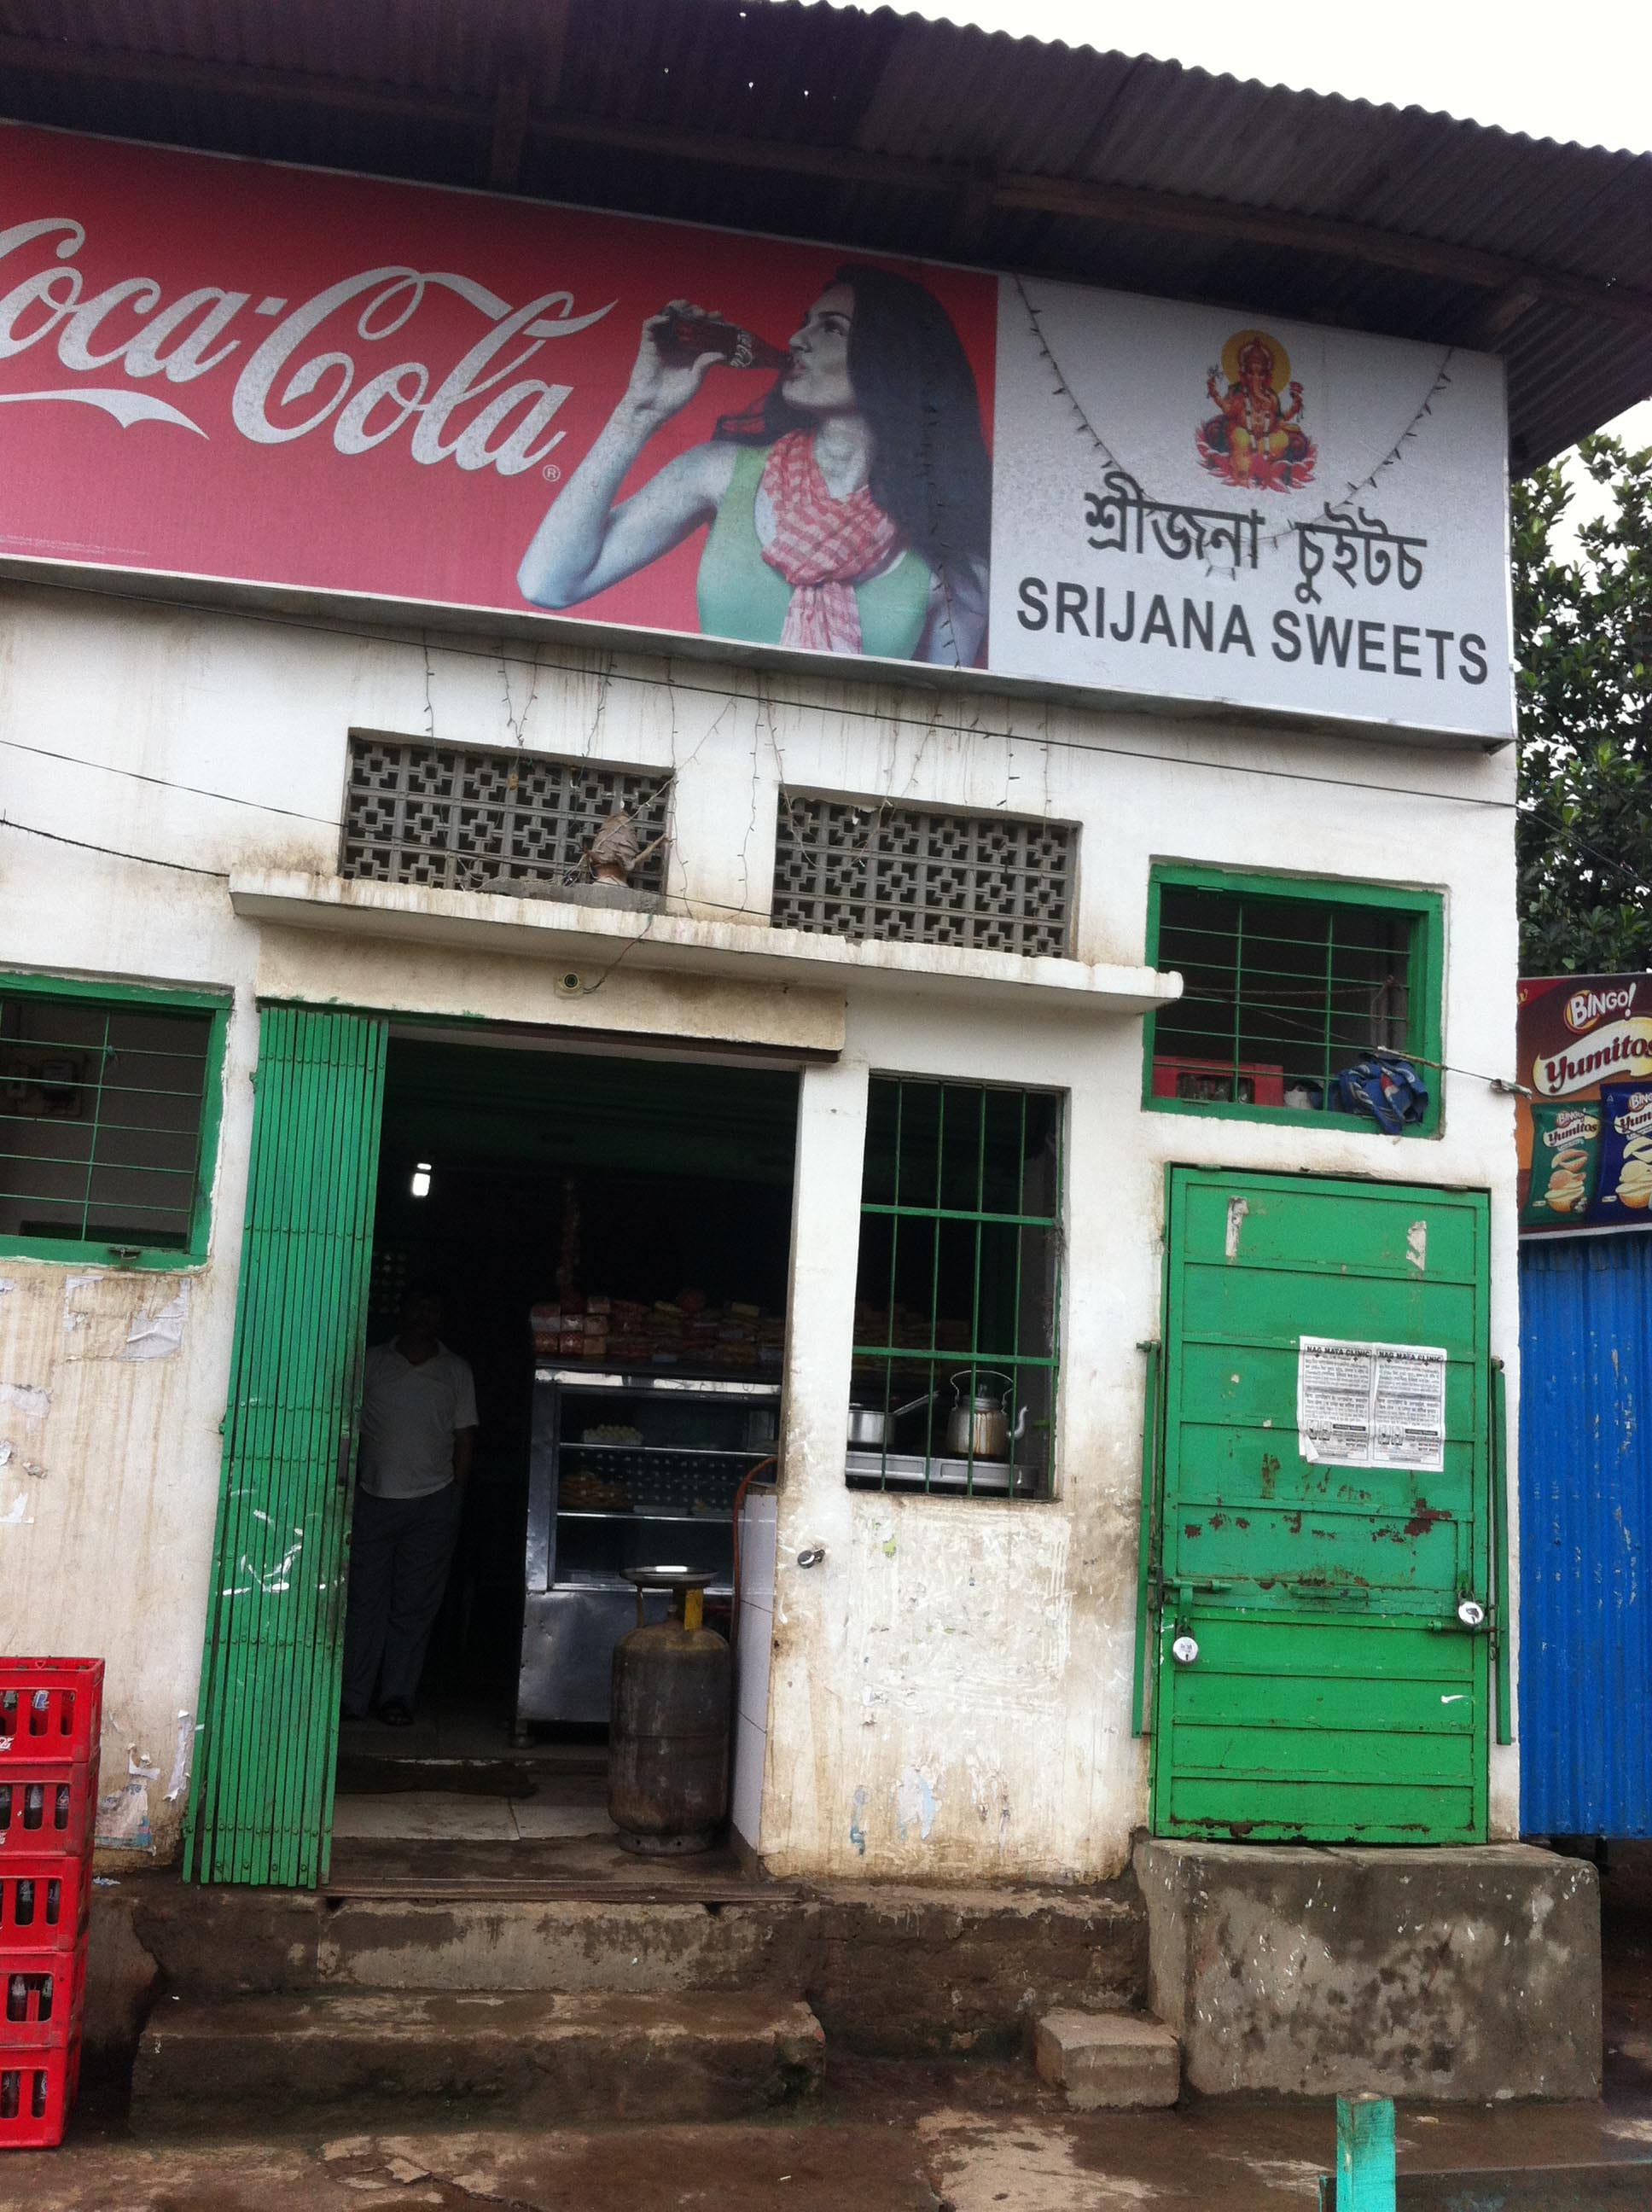 Srijana Sweets - Khanapara - Guwahati Image